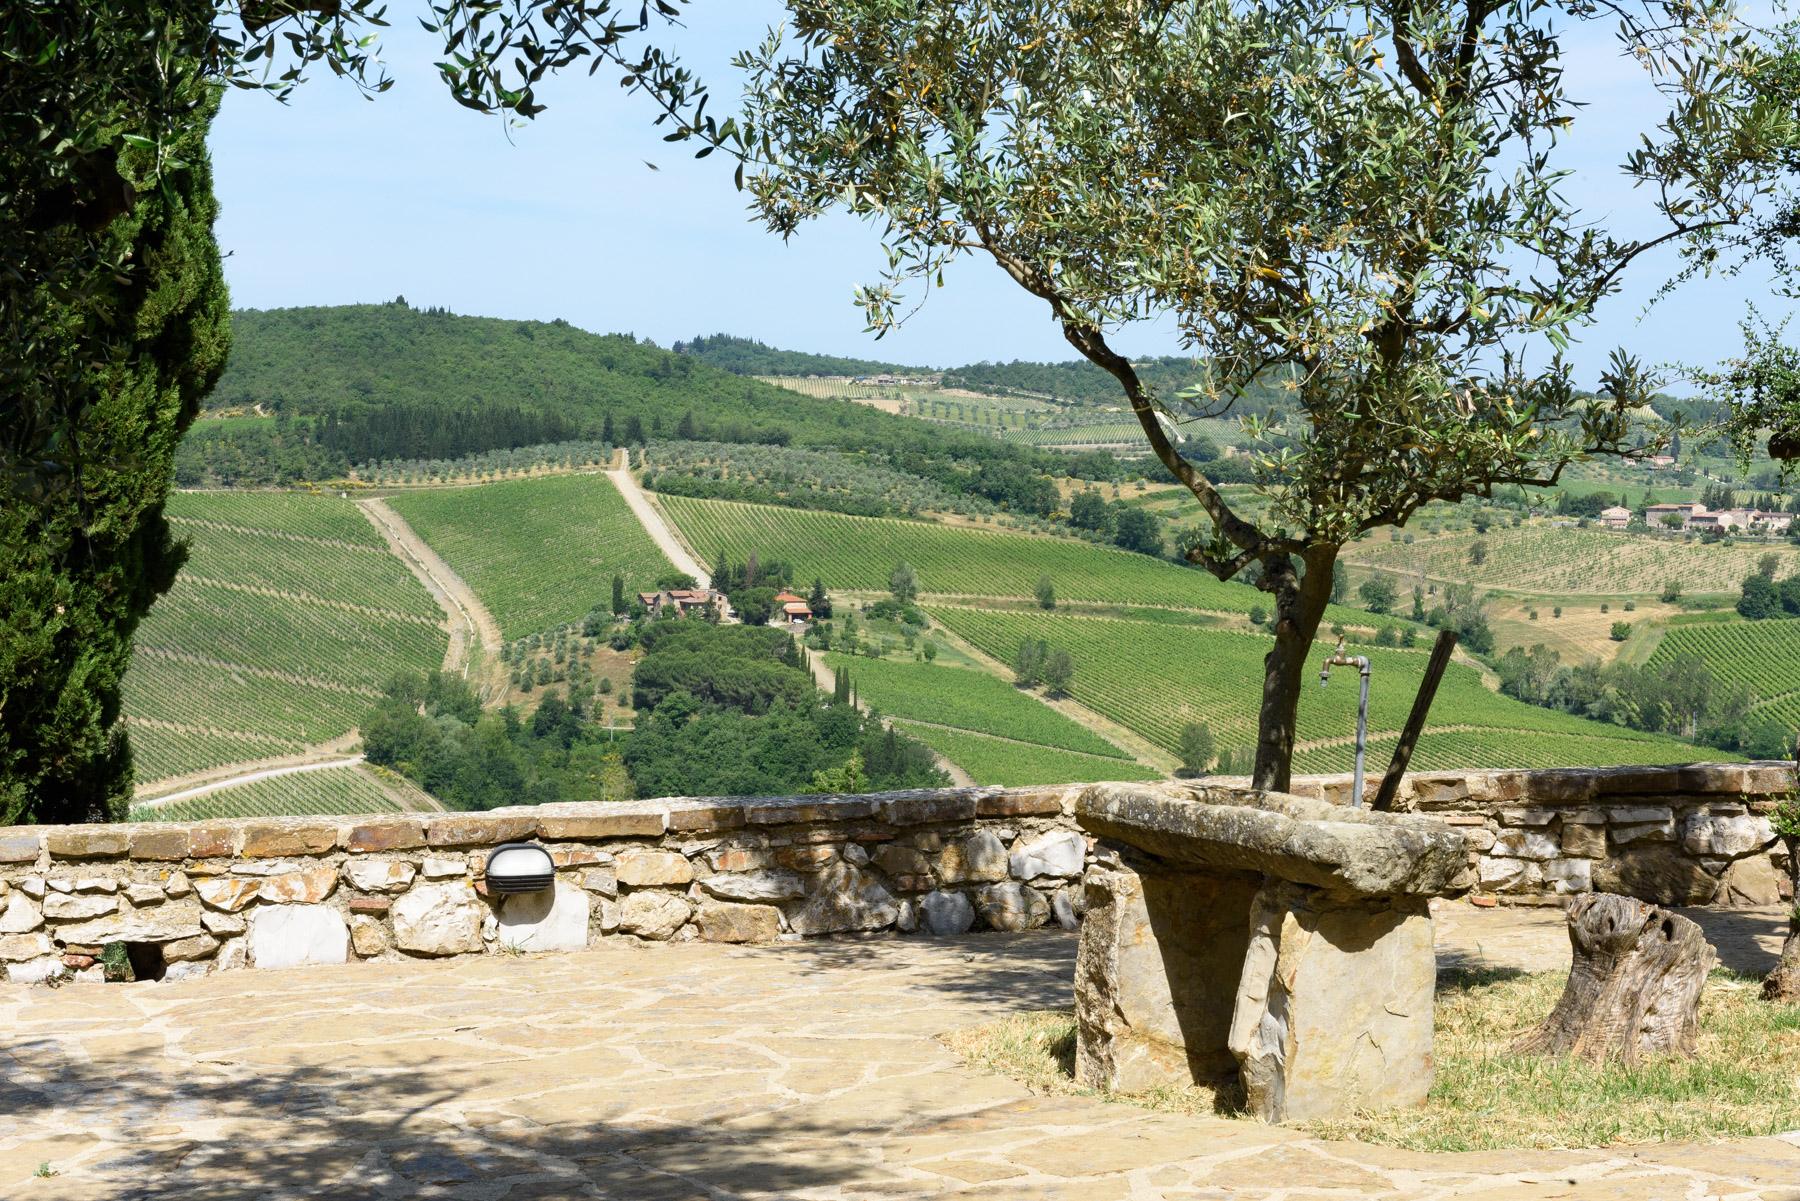 Rustico in Vendita a Castellina In Chianti: 5 locali, 650 mq - Foto 20